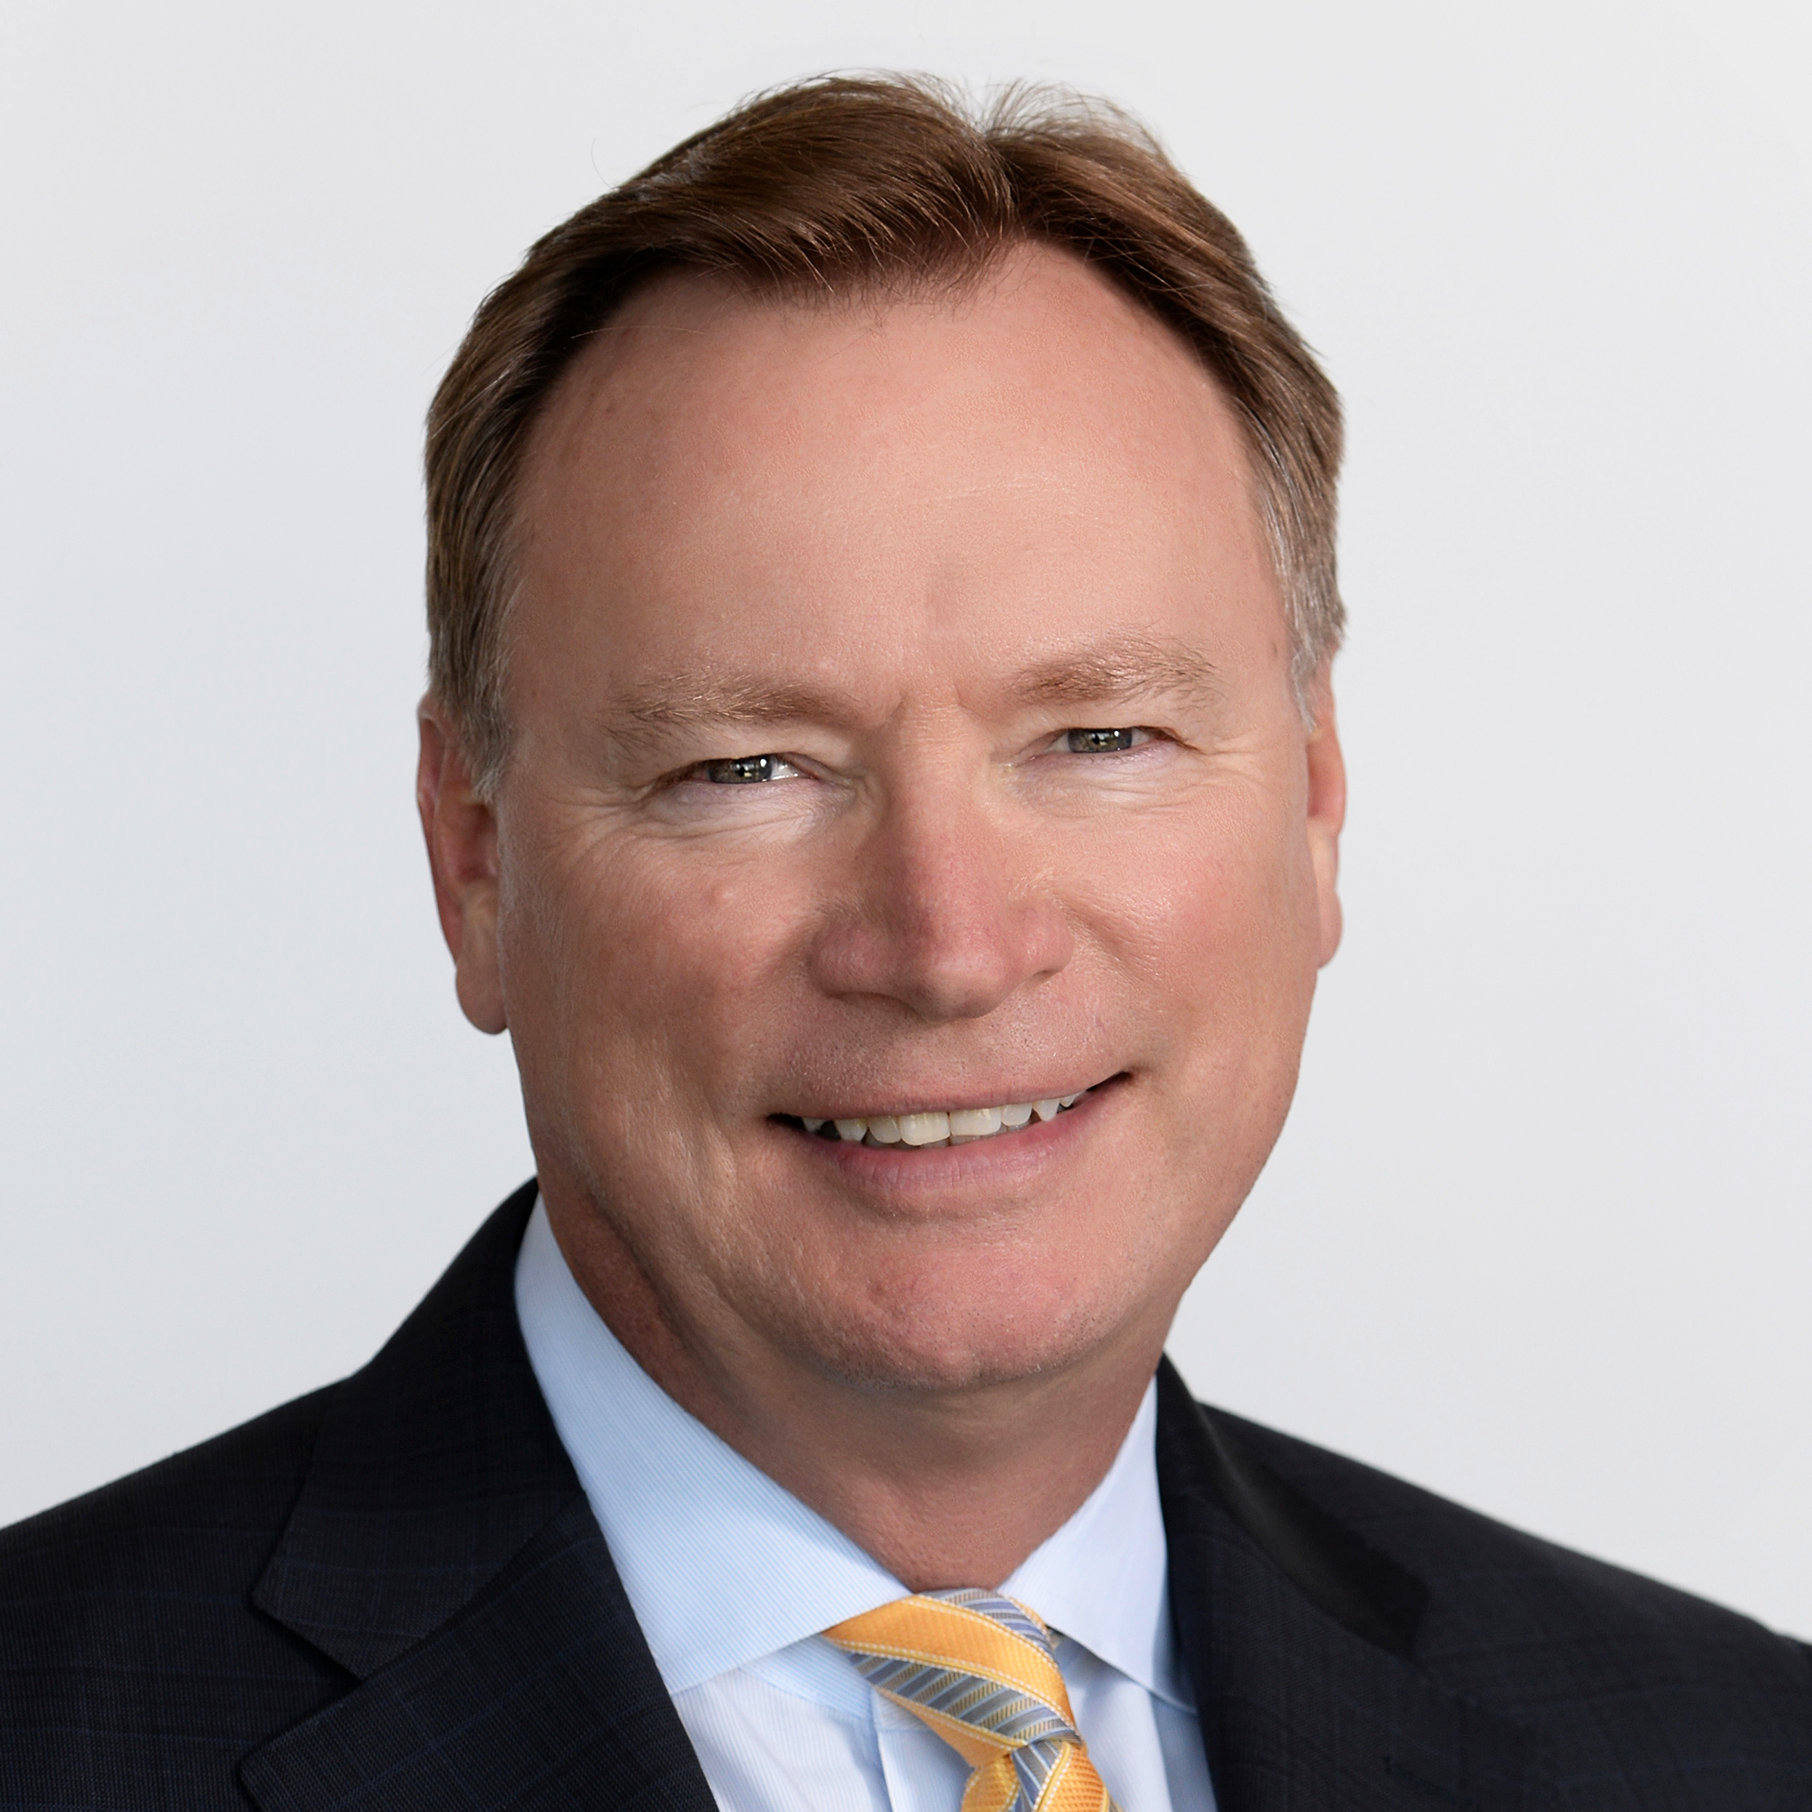 Michael E. McCarty